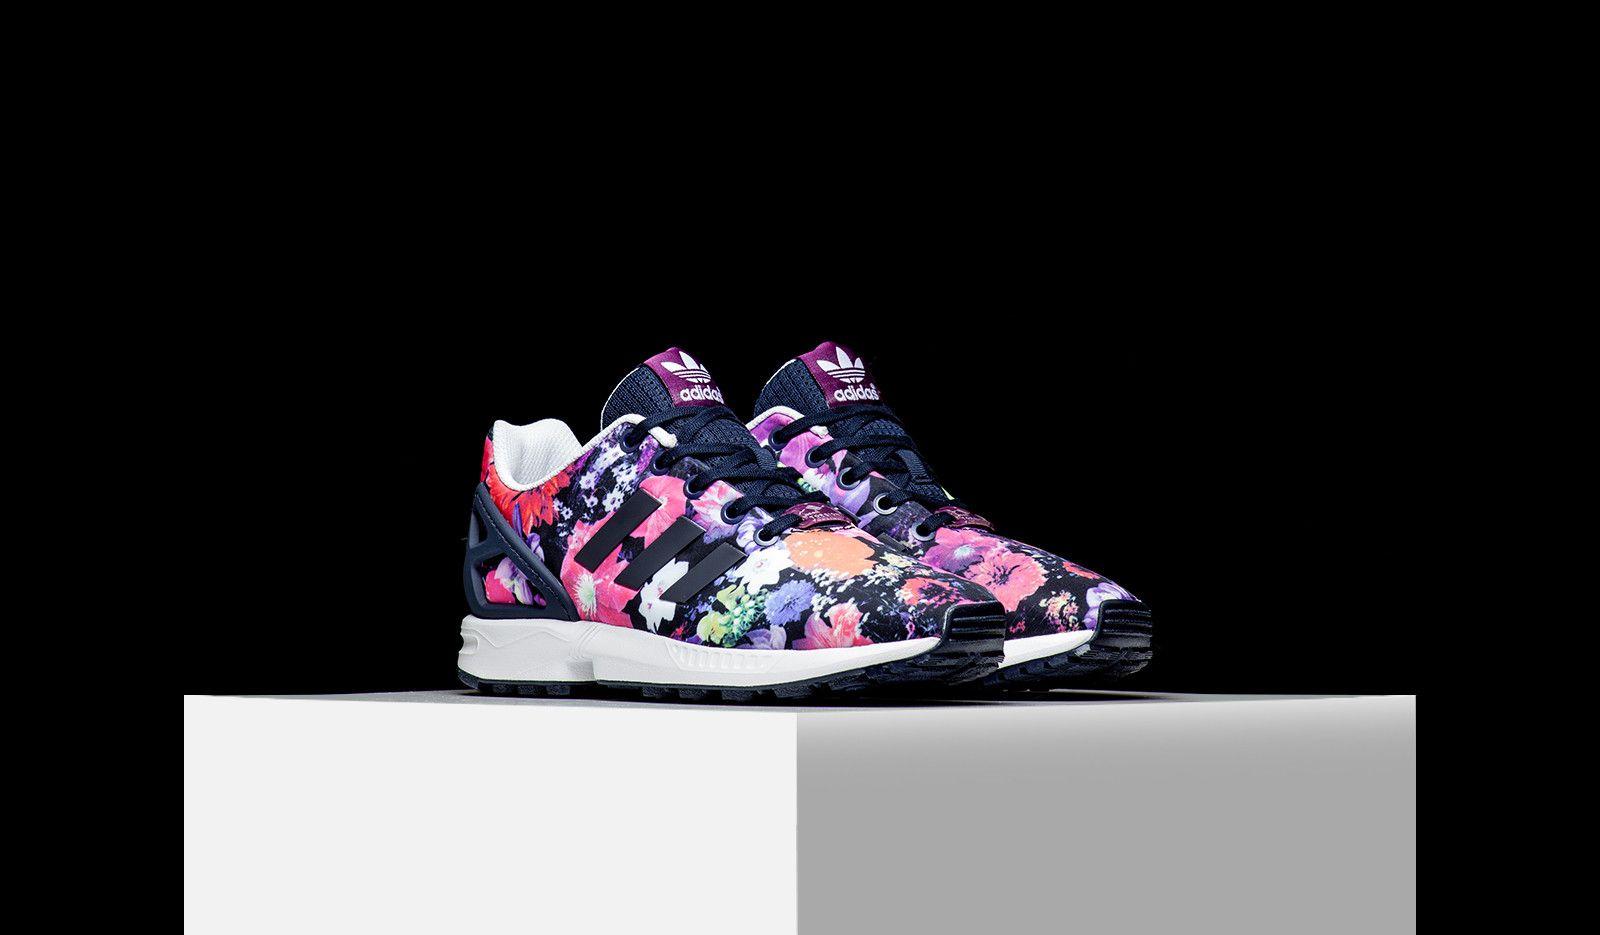 Shop Distinctive adidas torsion trainers,adidas women zx